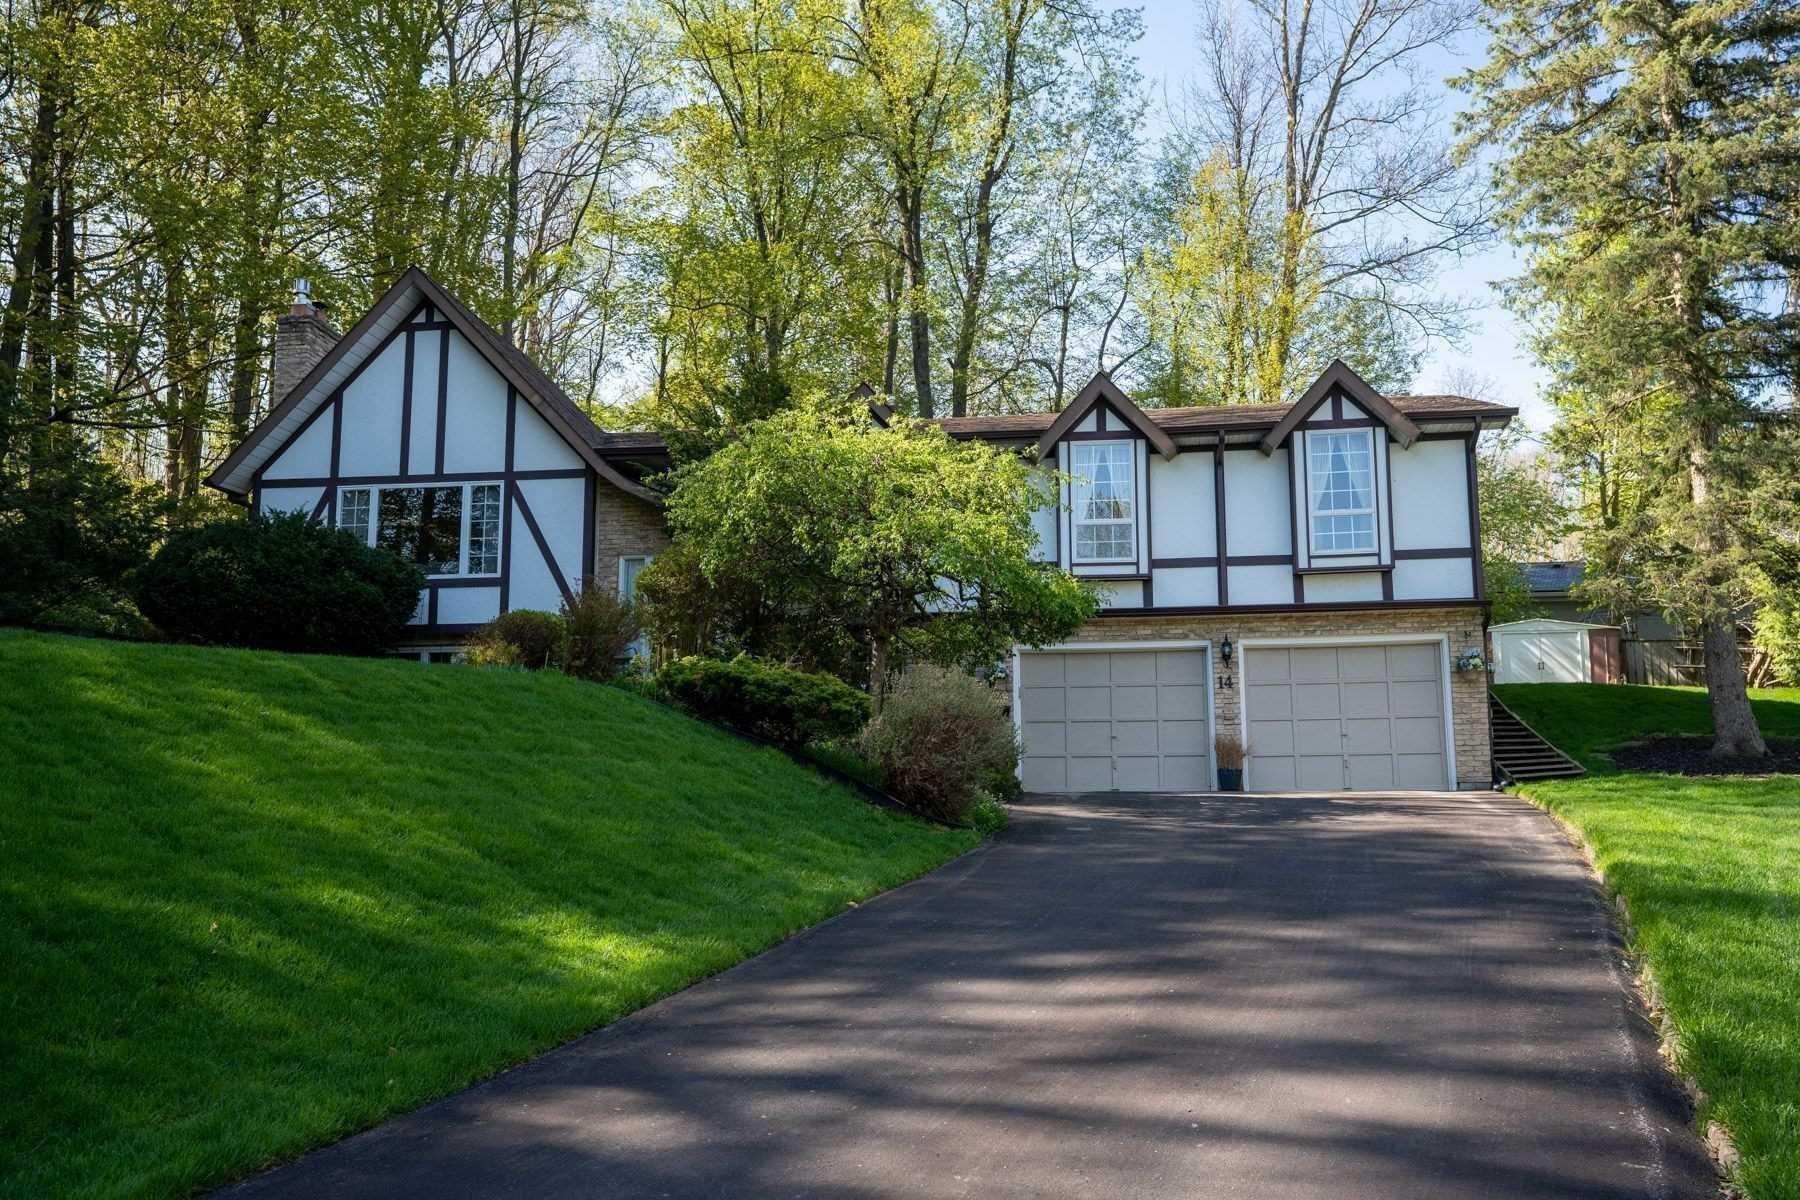 Main Photo: 14 Mullen Place in Halton Hills: Glen Williams House (Bungalow-Raised) for sale : MLS®# W4843358